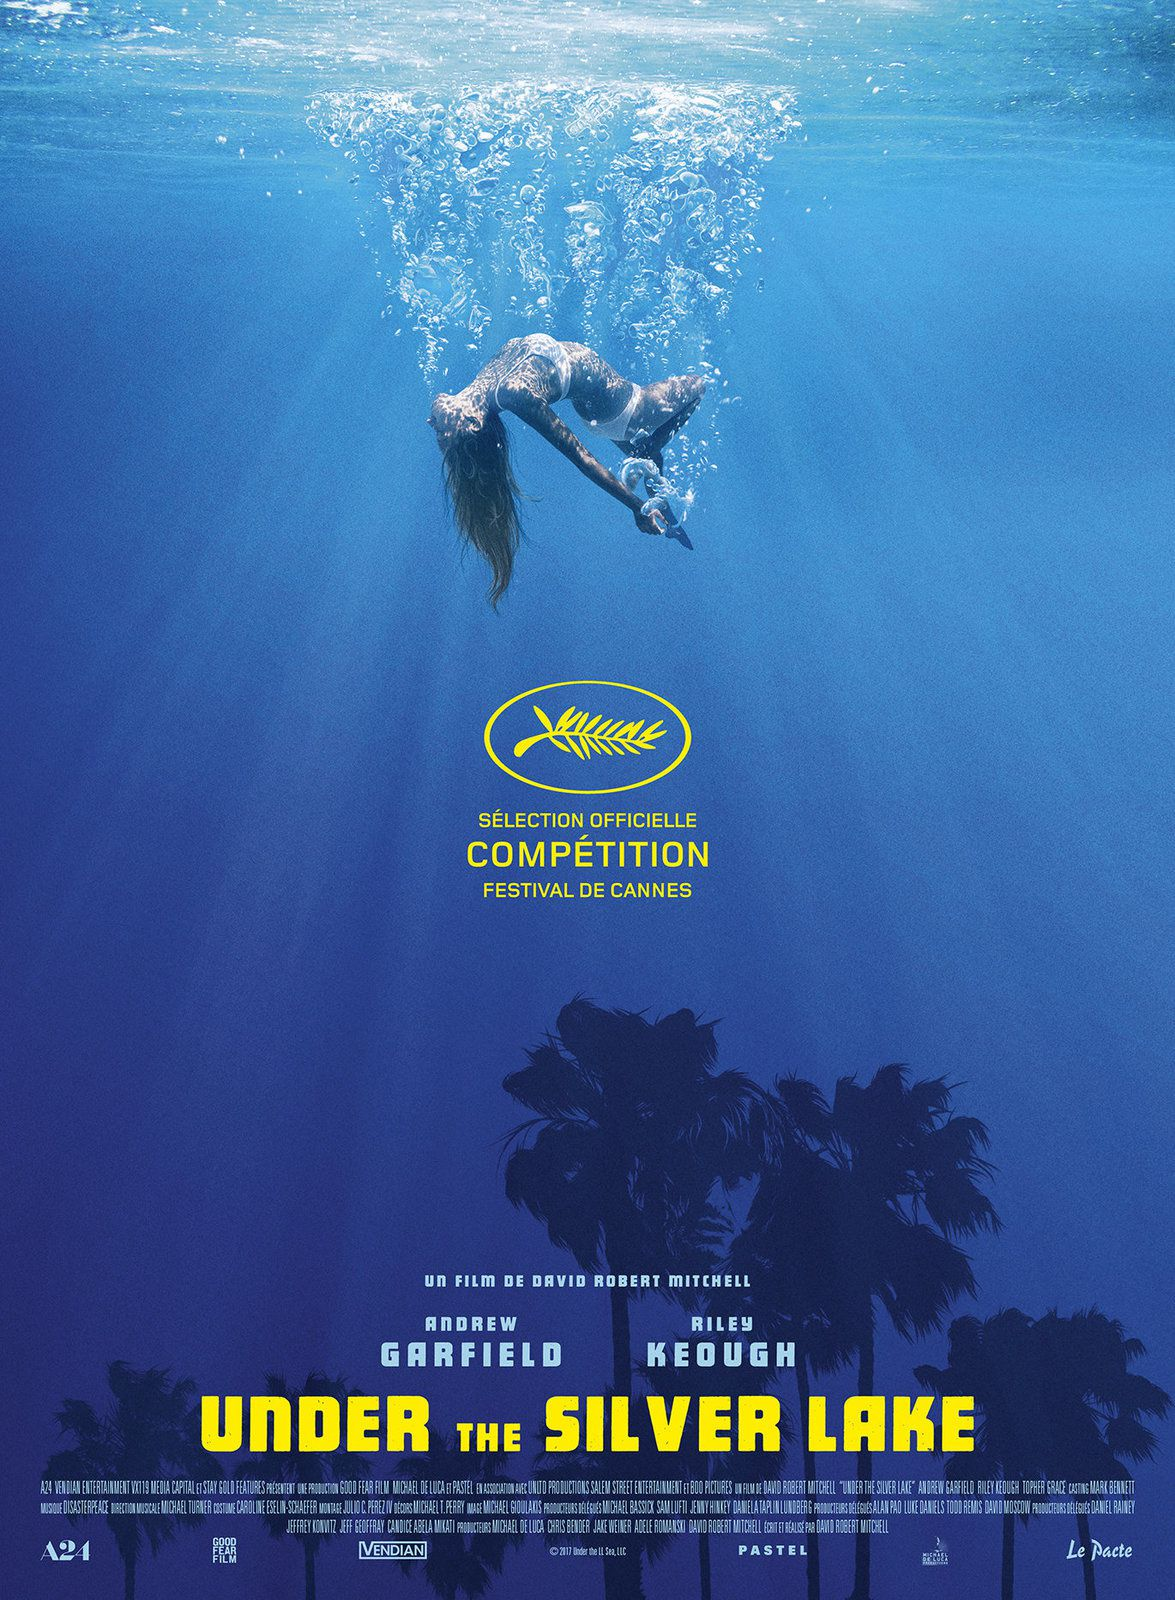 Under The Silver Lake (BANDE-ANNONCE) avec Andrew Garfield, Riley Keough, Topher Grace - Le 8 août 2018 au cinéma